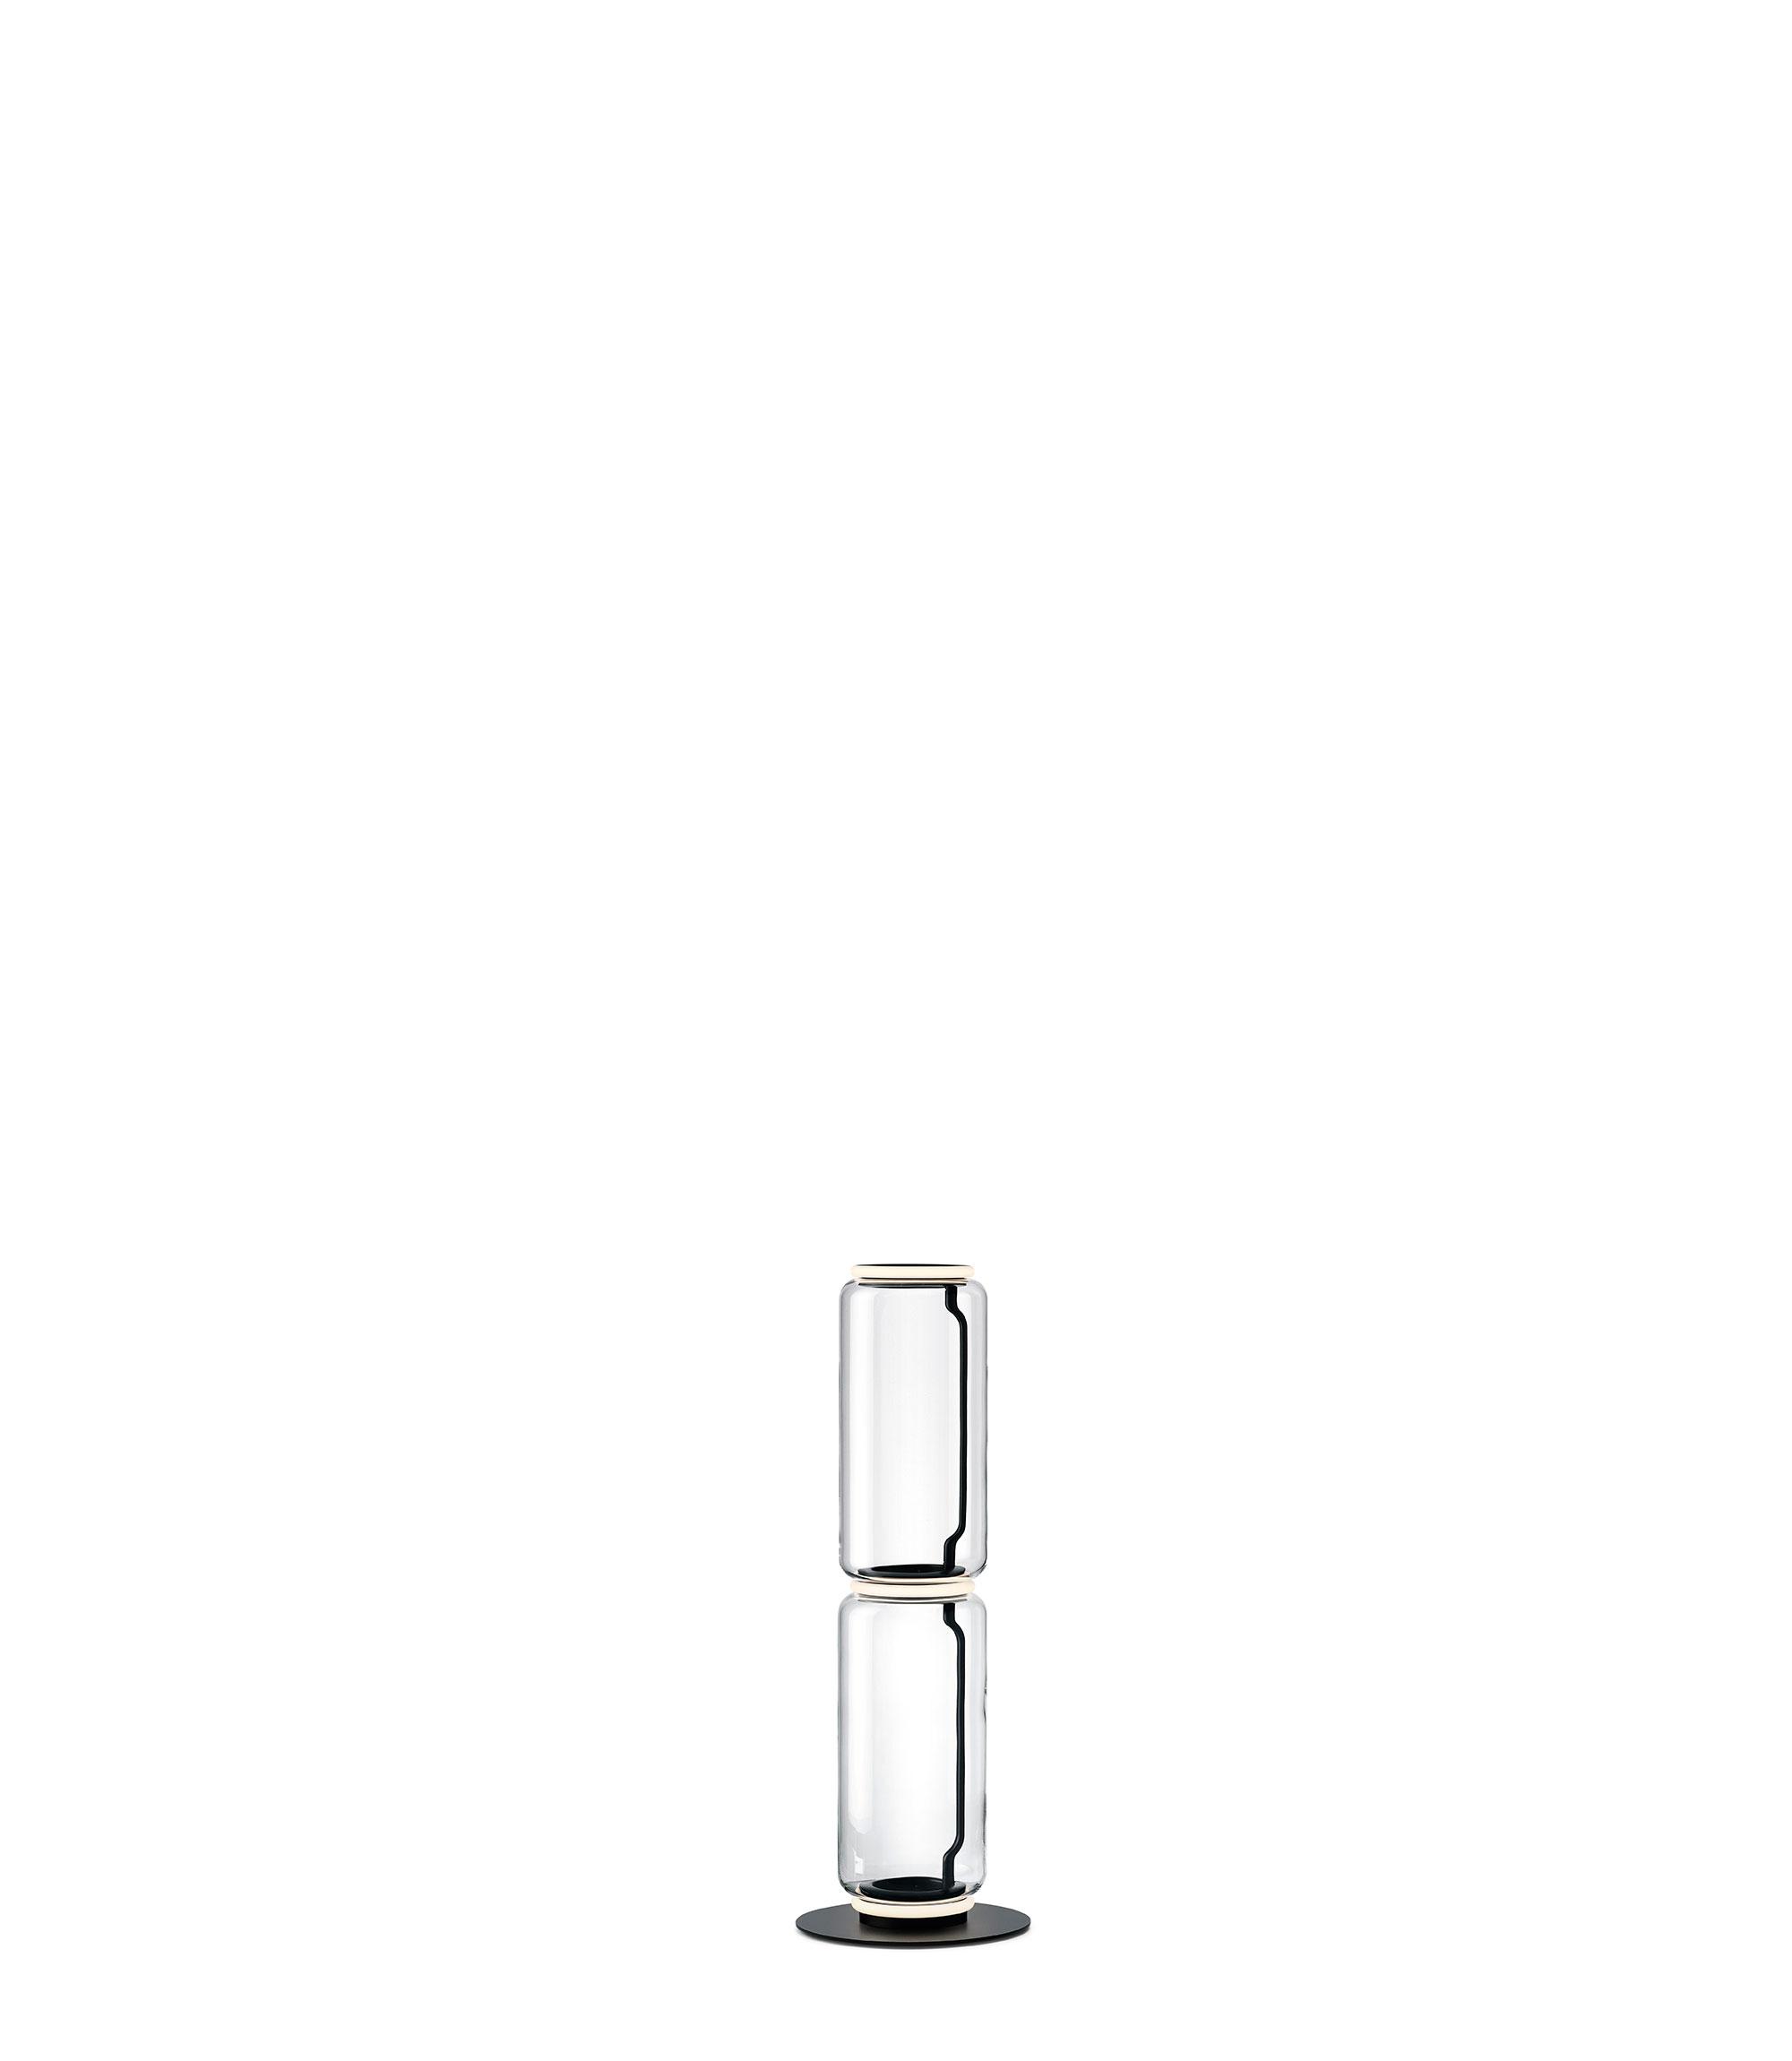 Noctambule floor 2 high cylinders small base grcic flos F0286000 product still life big